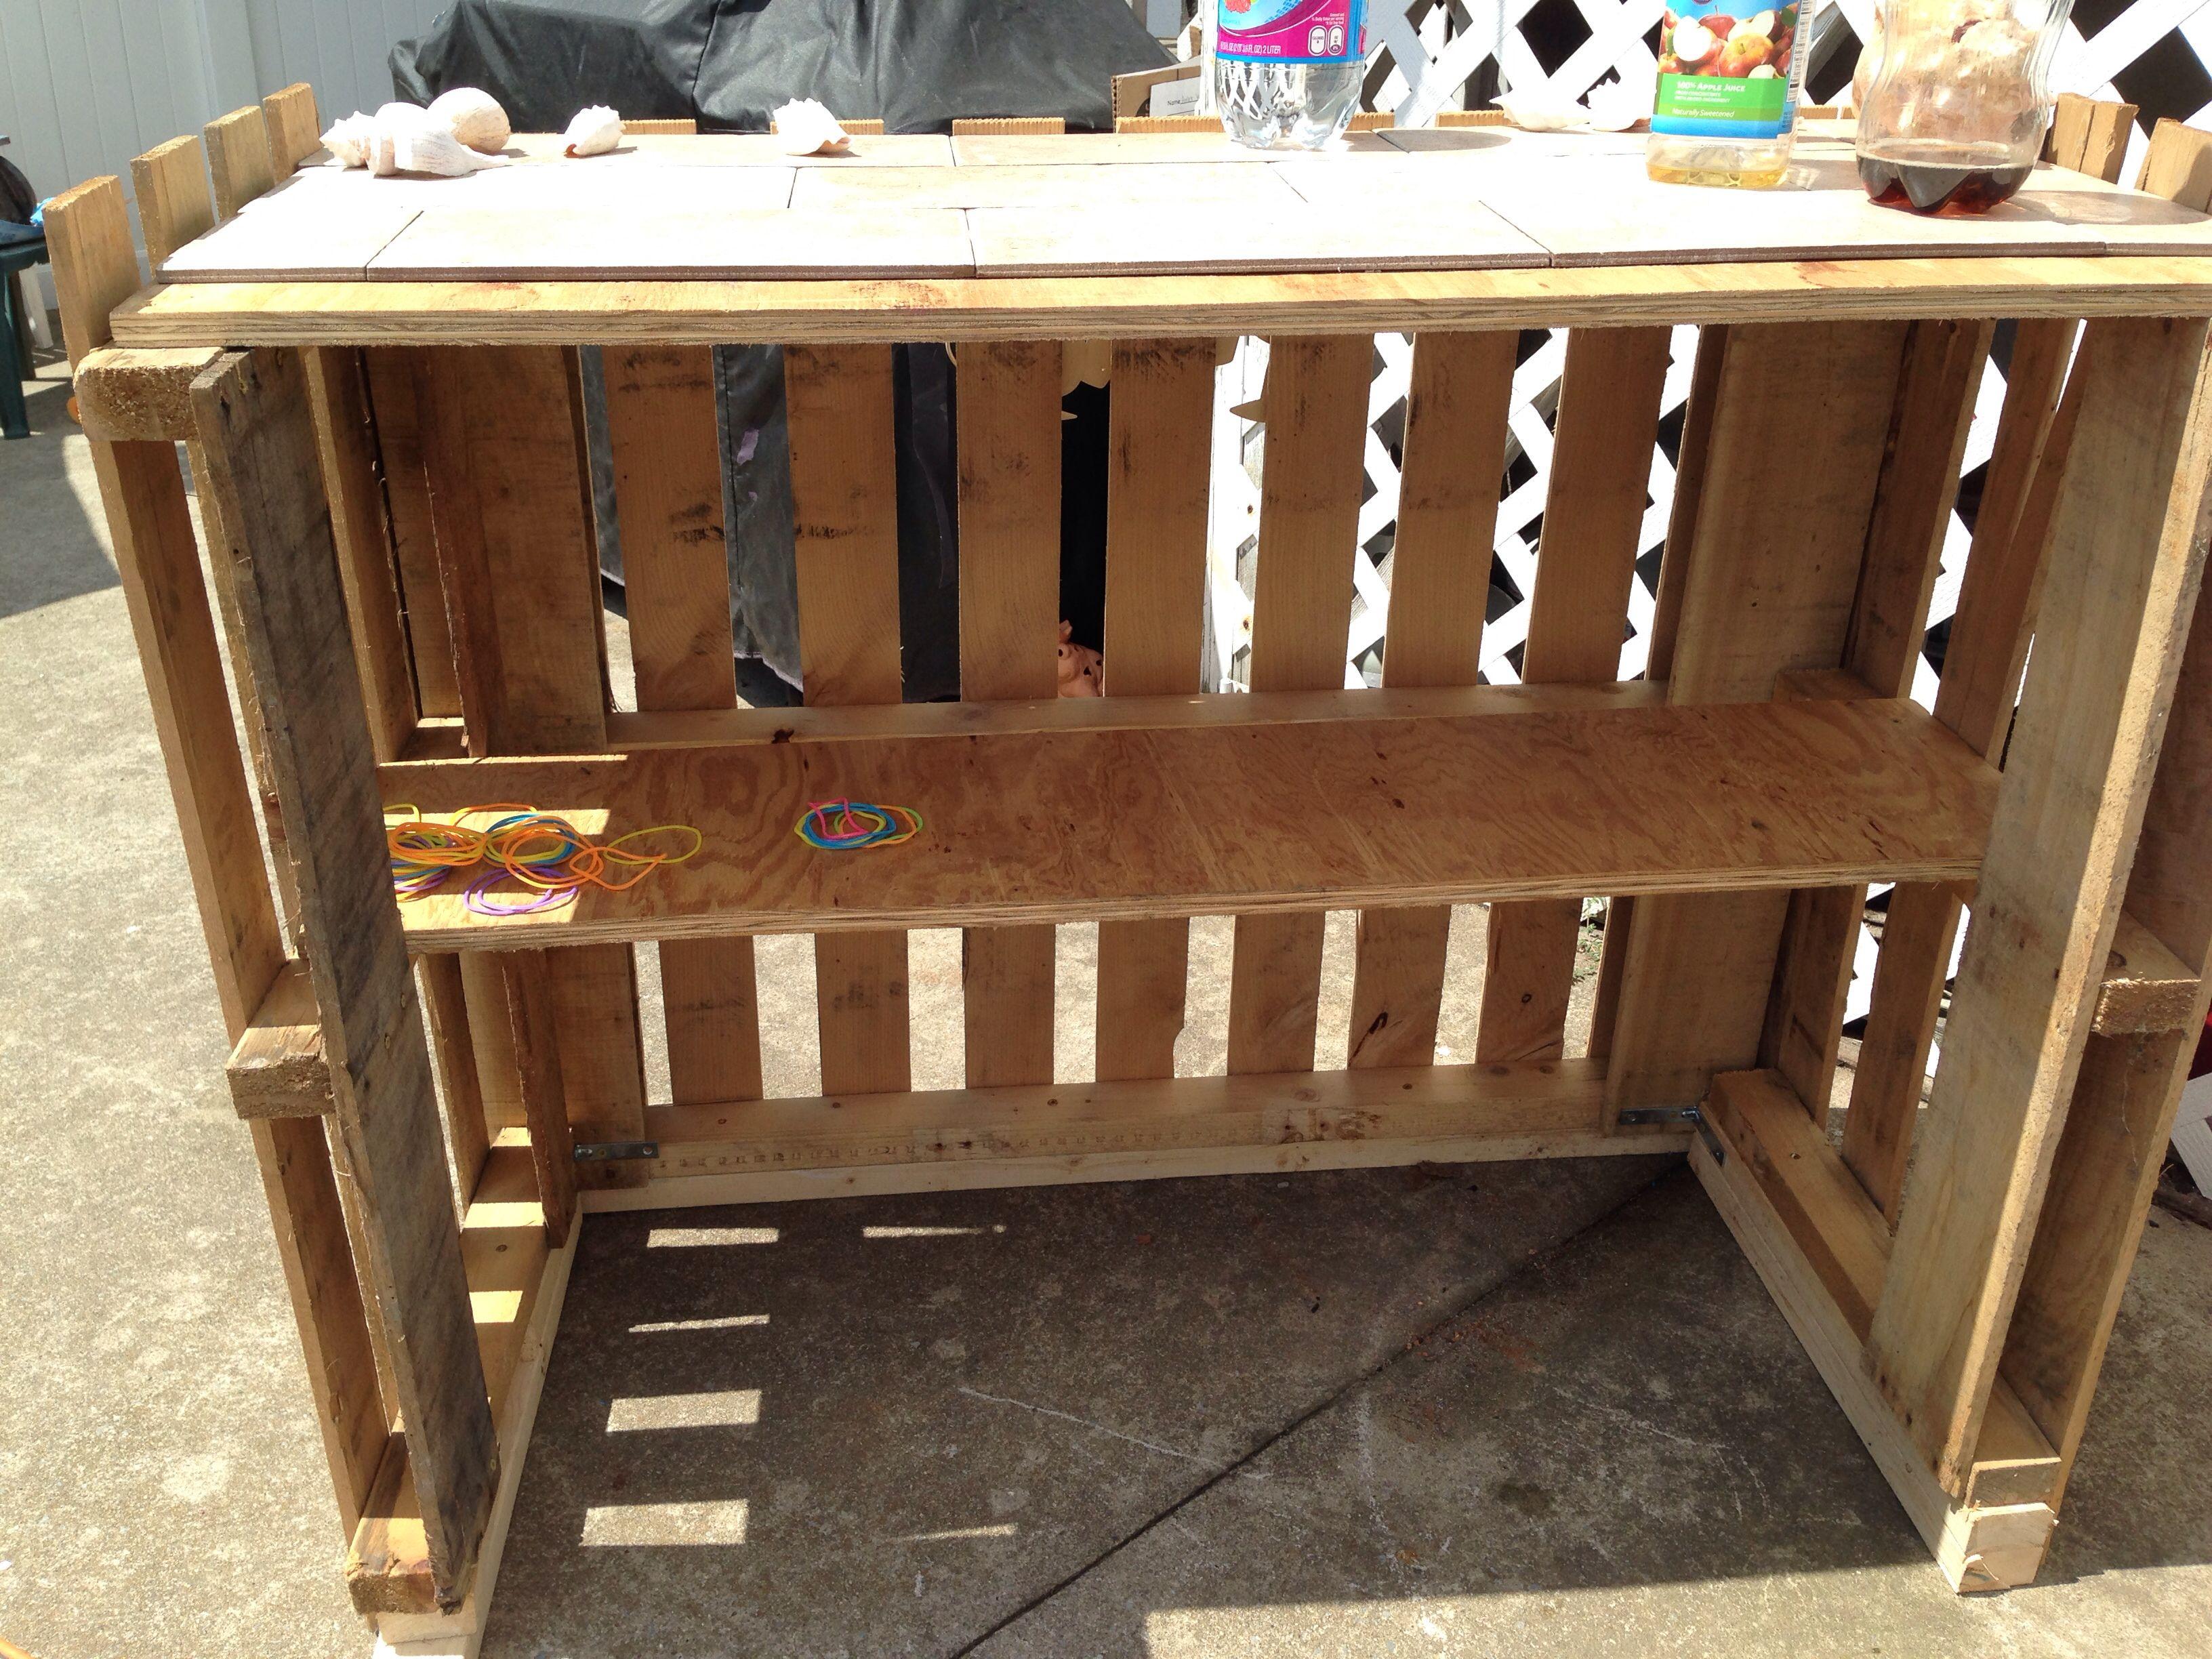 Mobili Pallet ~ Home made tiki bar from 2 pallets backyard ideas pinterest